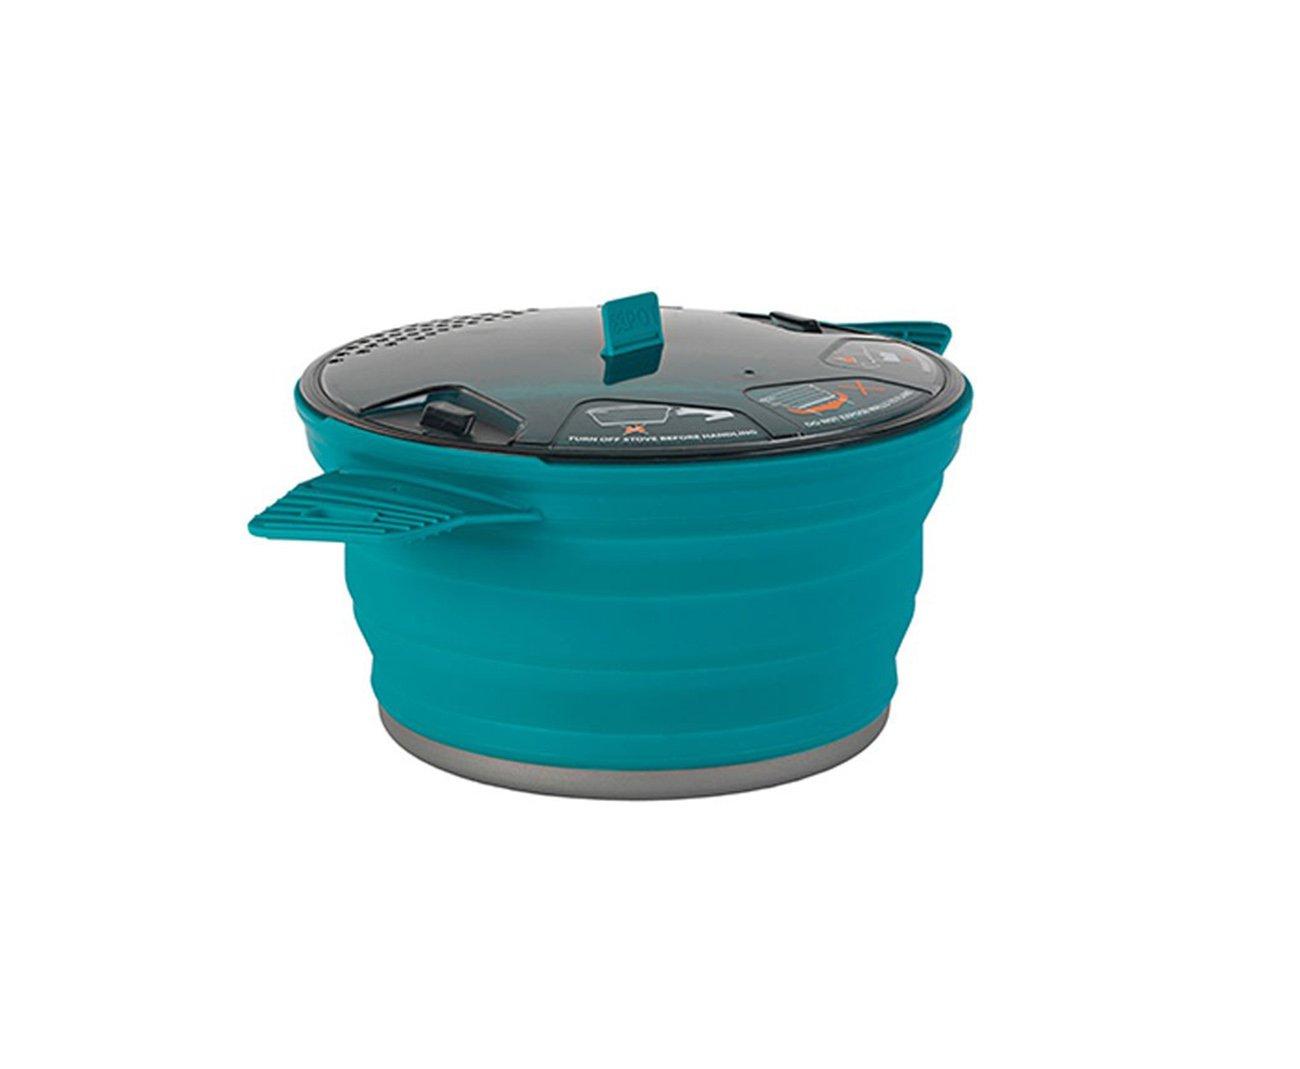 Panela X Pot Large 2.8 Litros Azul - Sea To Summit